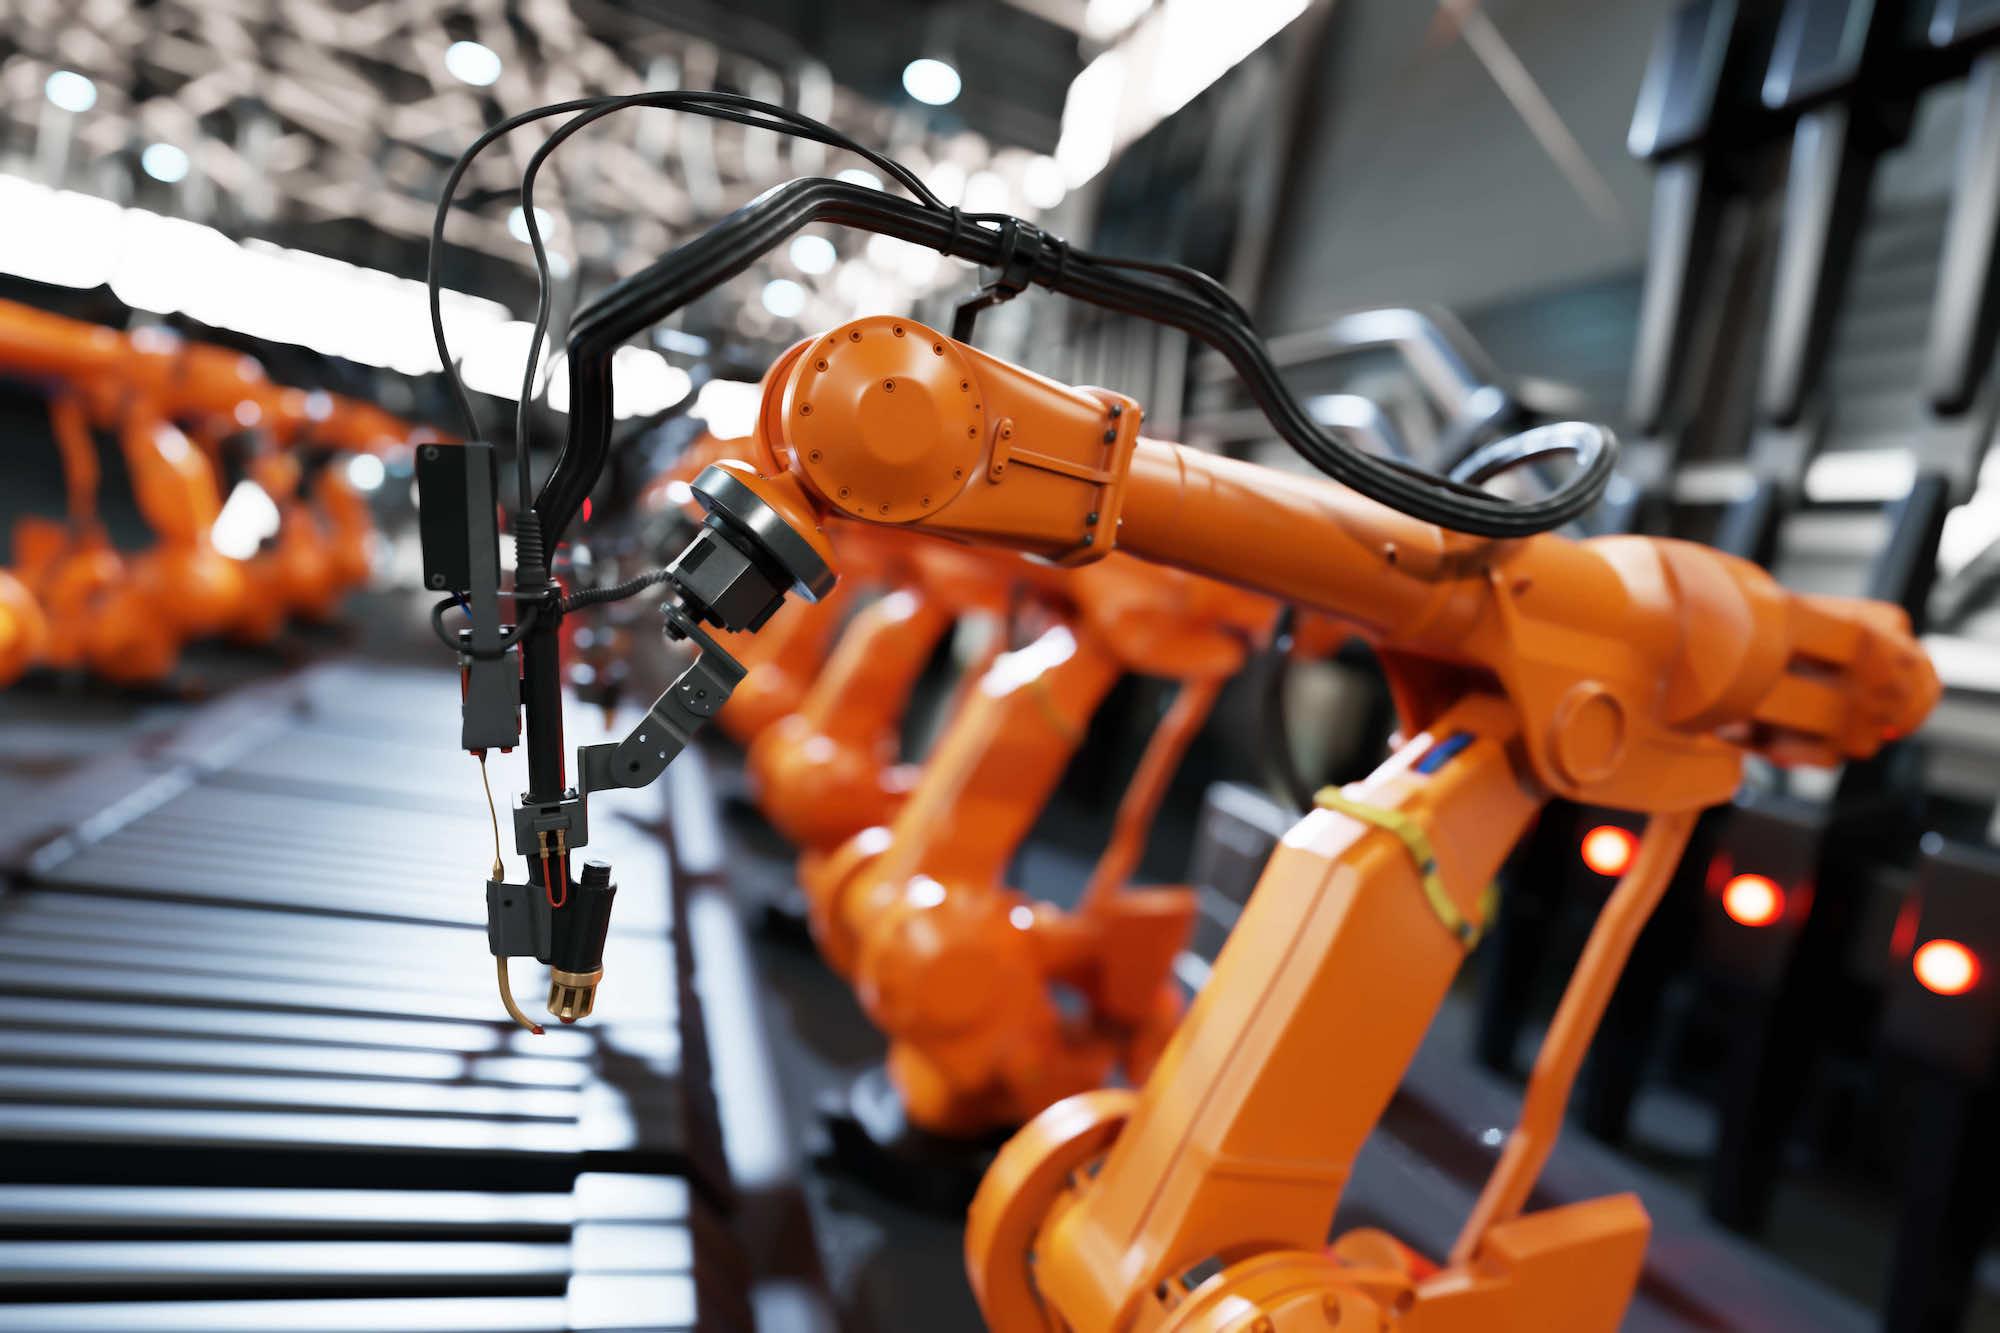 Bracci meccanici Industry 4.0 Ubilod